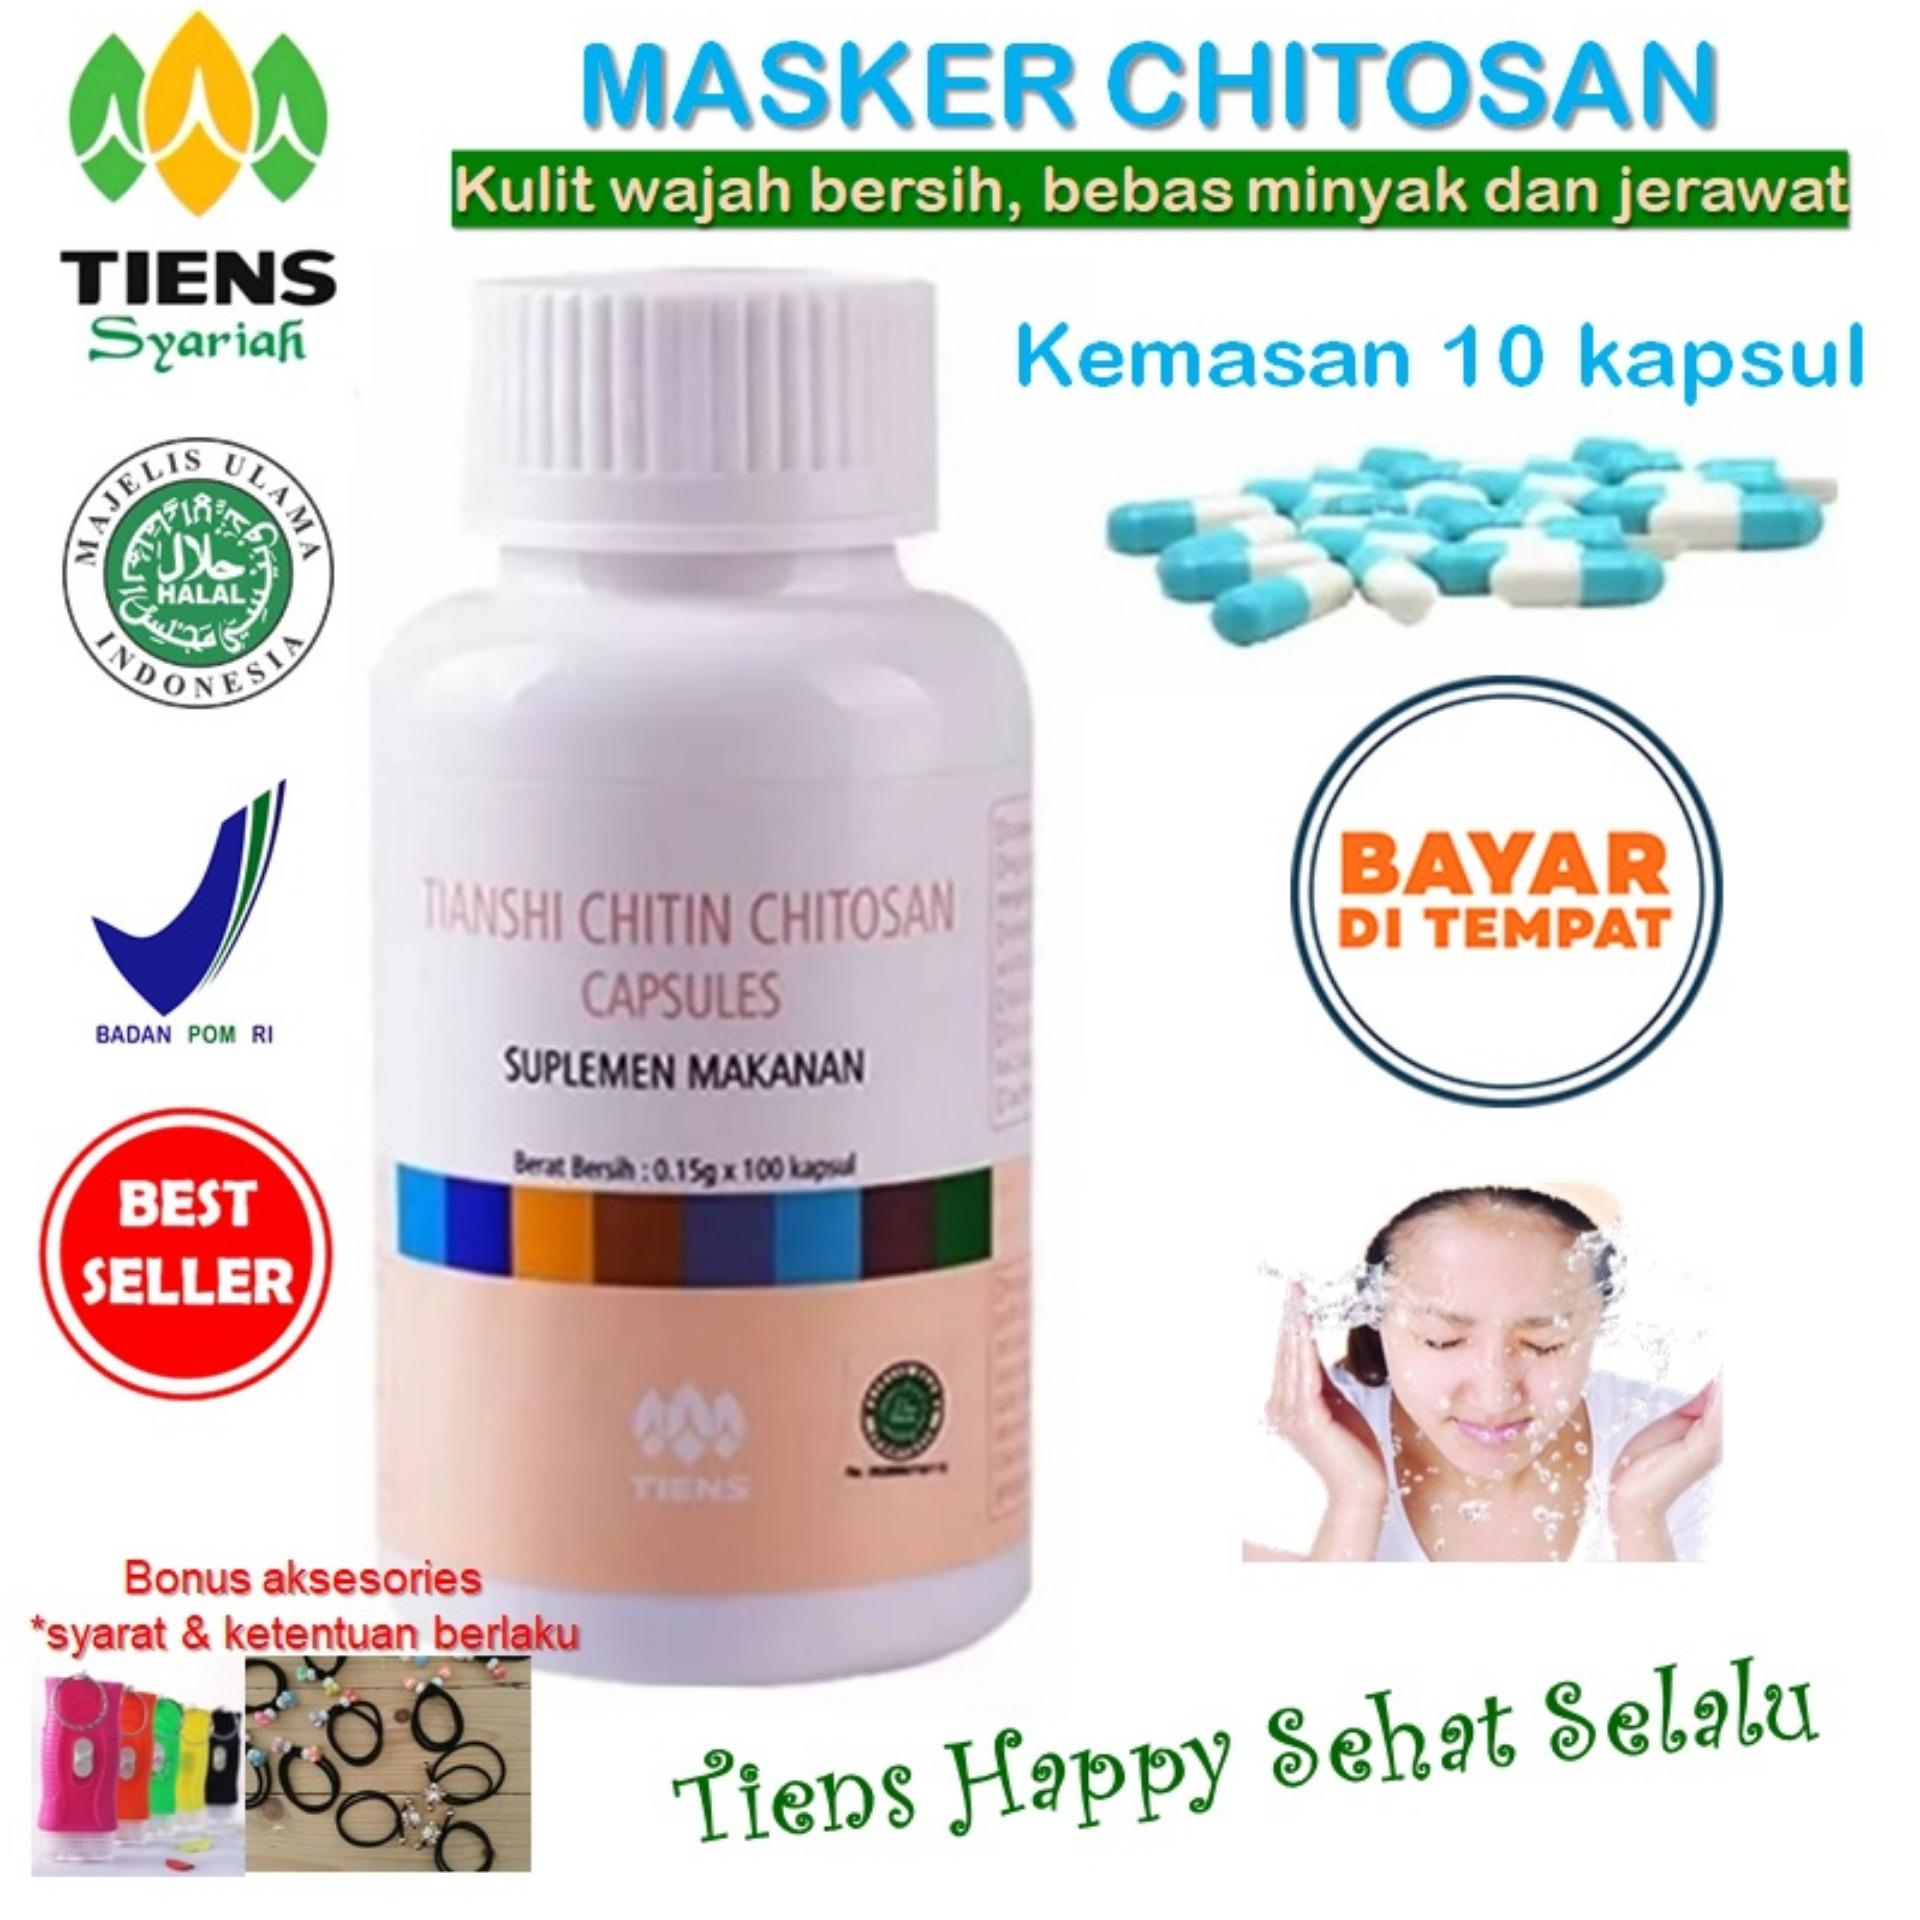 Tiens Masker Chitosan Herbal Anti Jerawat Paket 10 Kapsul Promo By Tiens Happy Sehat Selalu Original